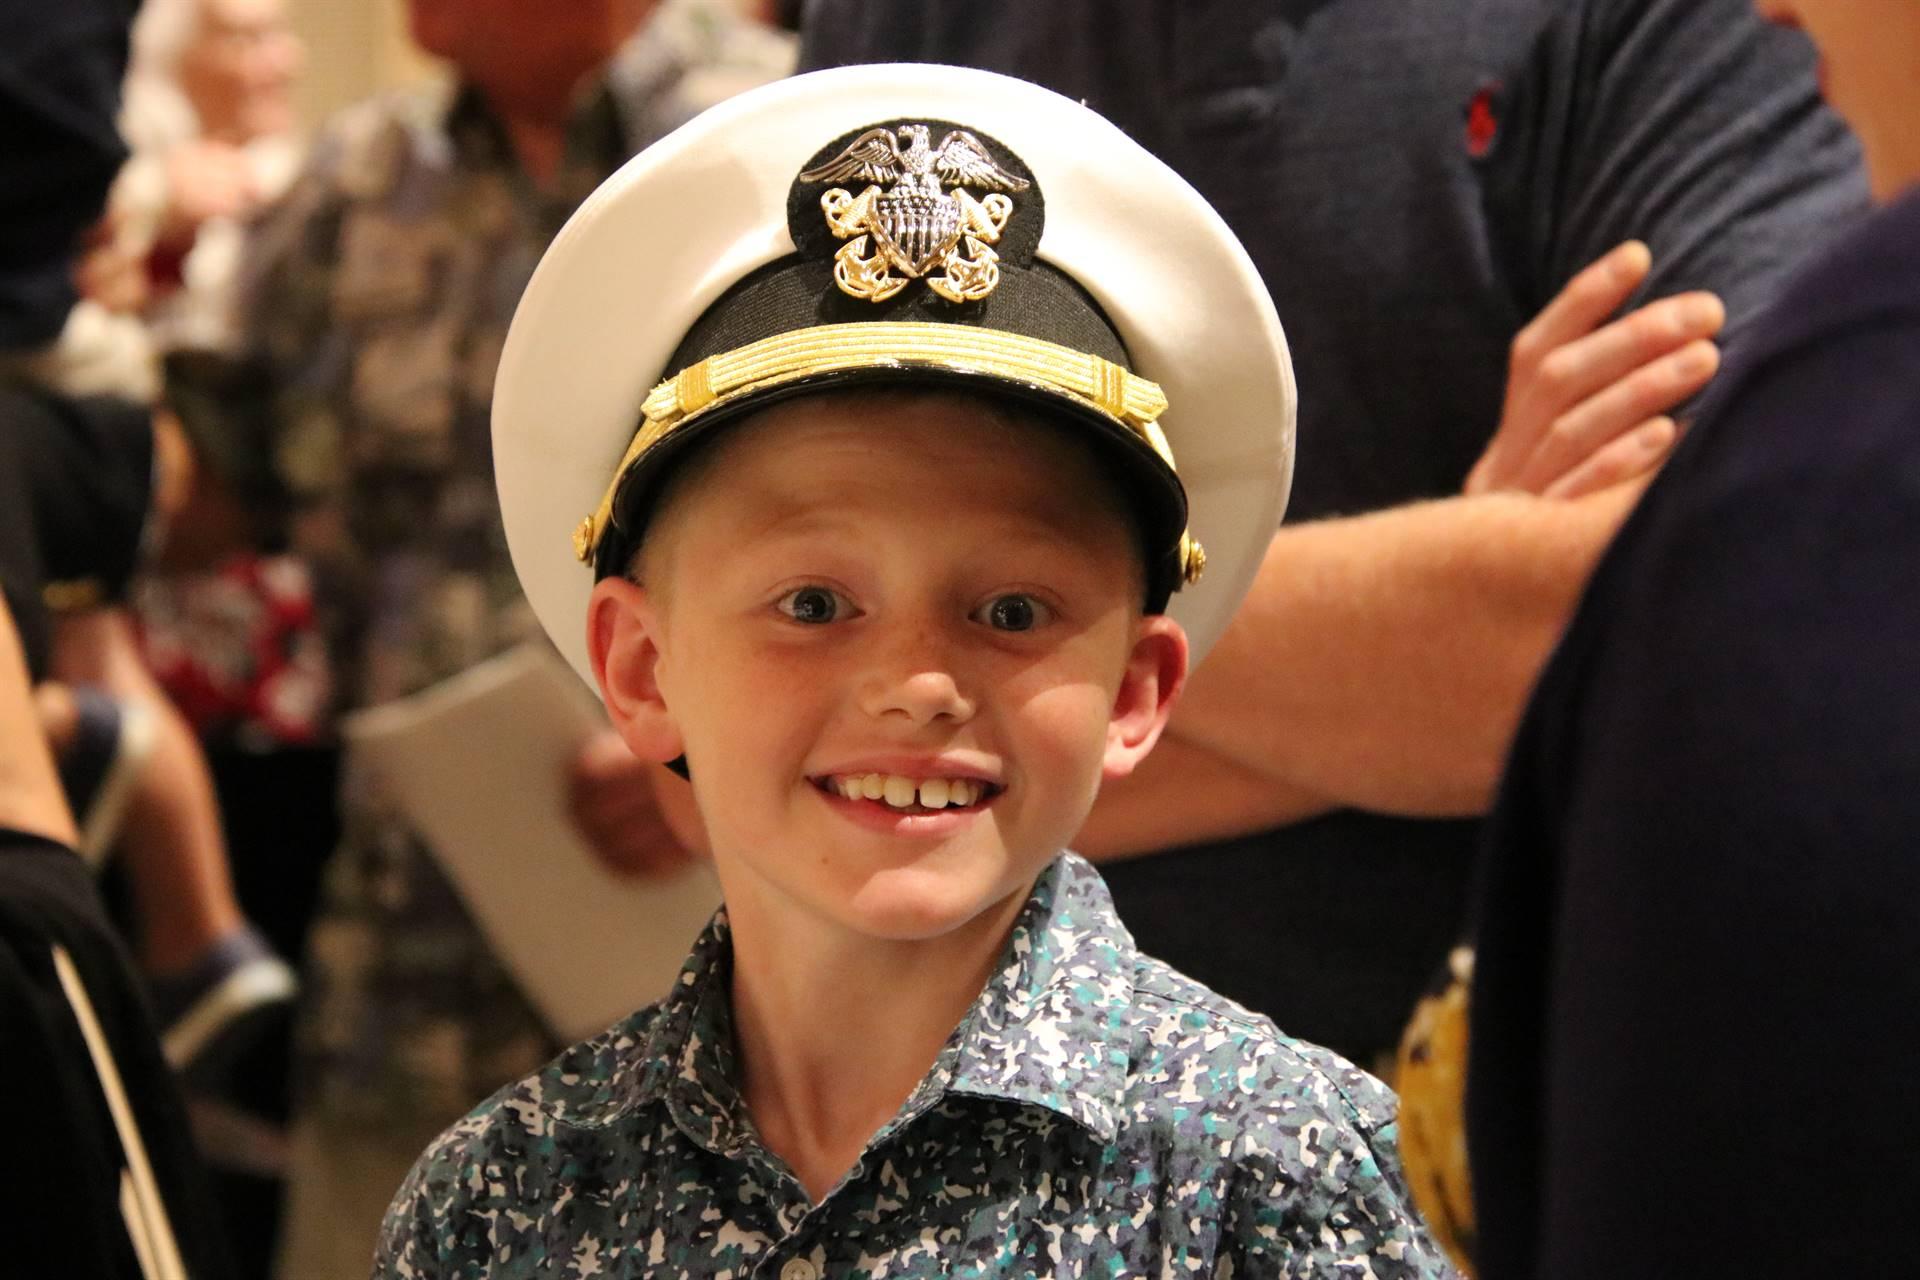 Boy attending Hall of Distinction